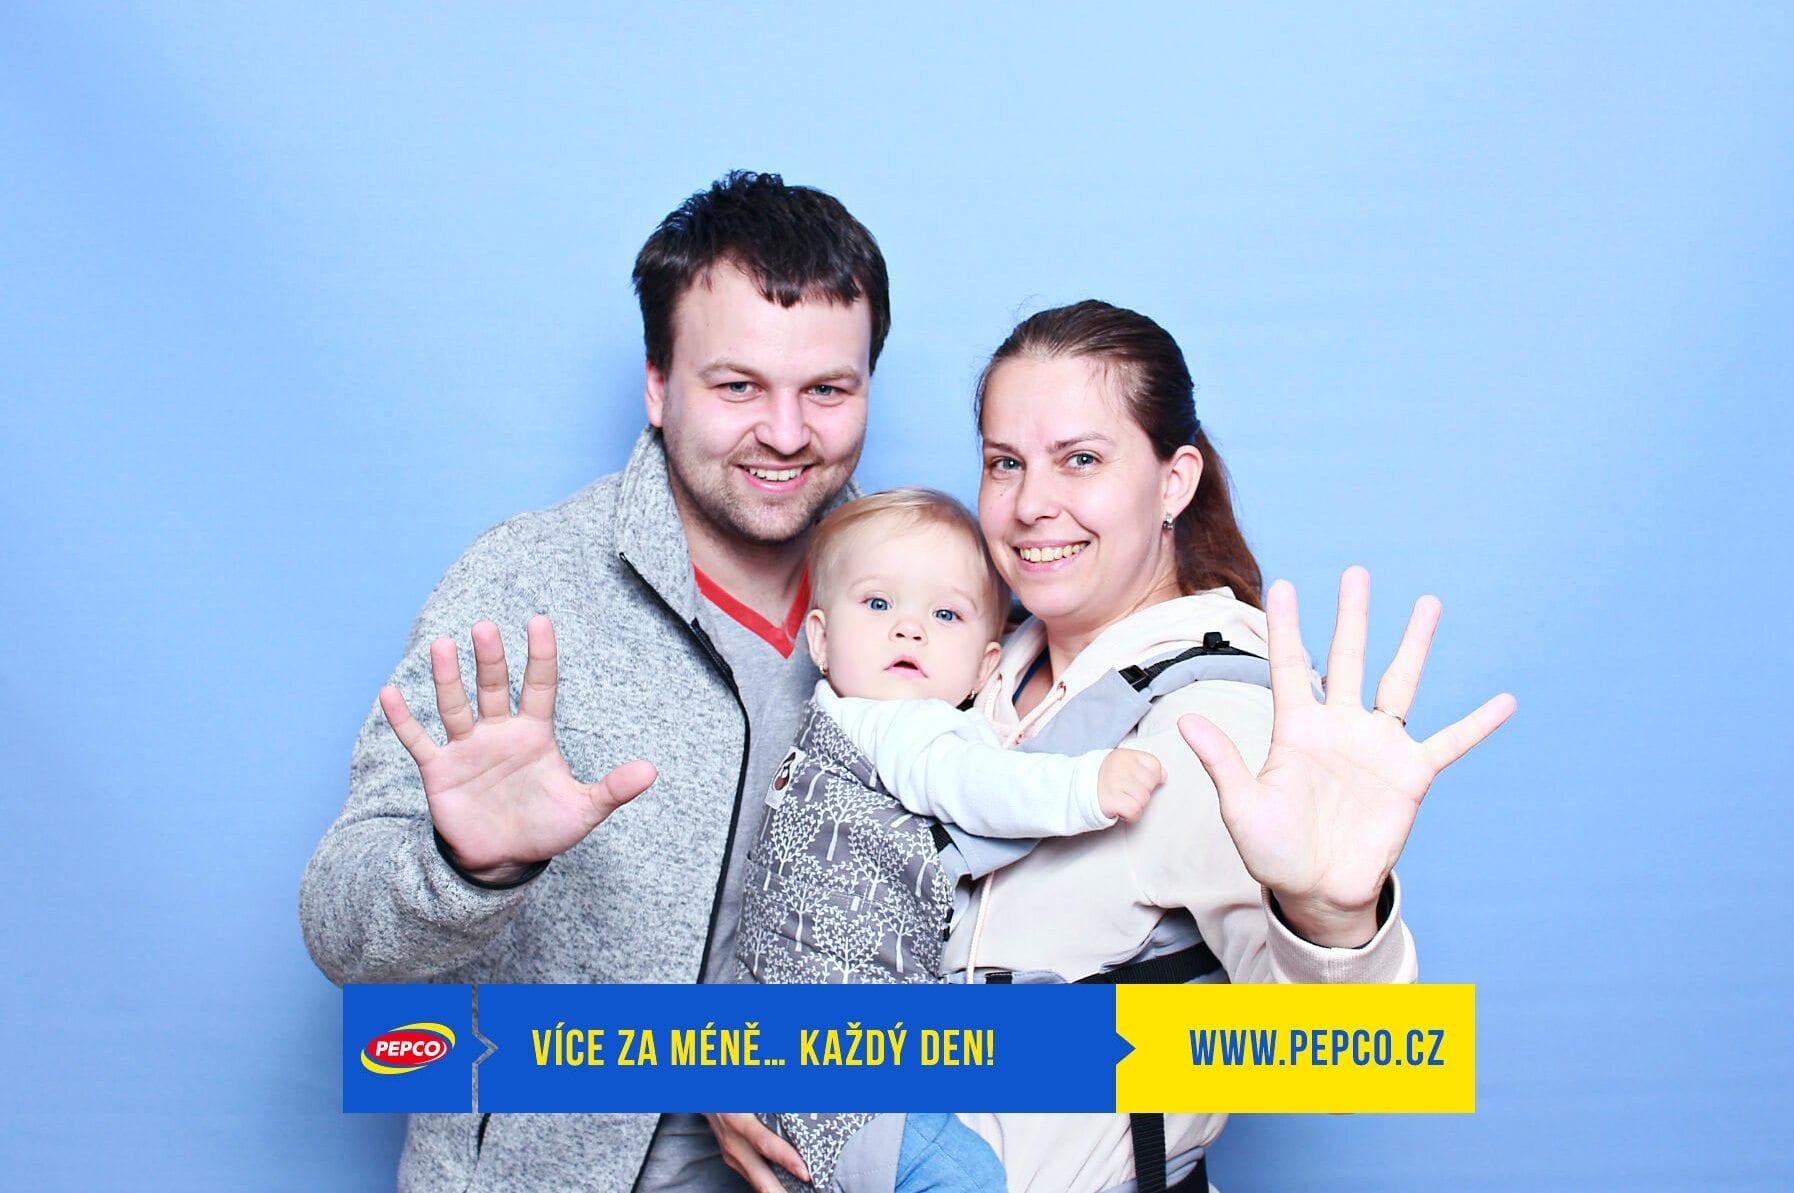 fotokoutek-pepco-27-4-2017-238600